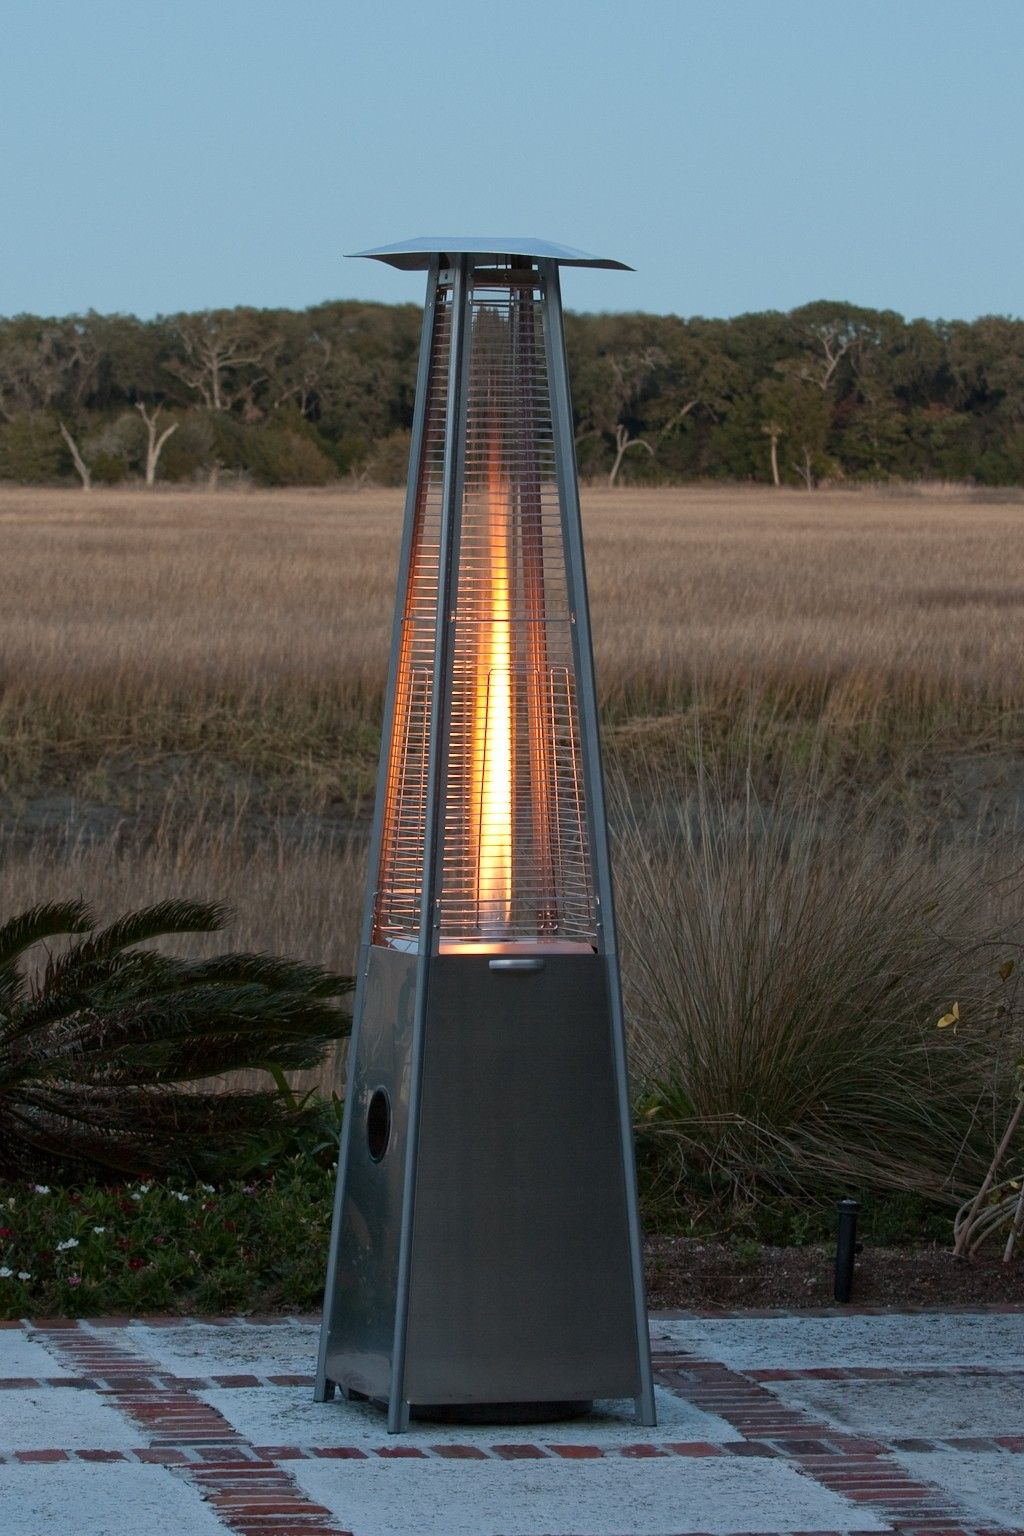 Delightful Fire Sense Pyramid Flame Propane Patio Heater | Wayfair $331 40,000 BTU